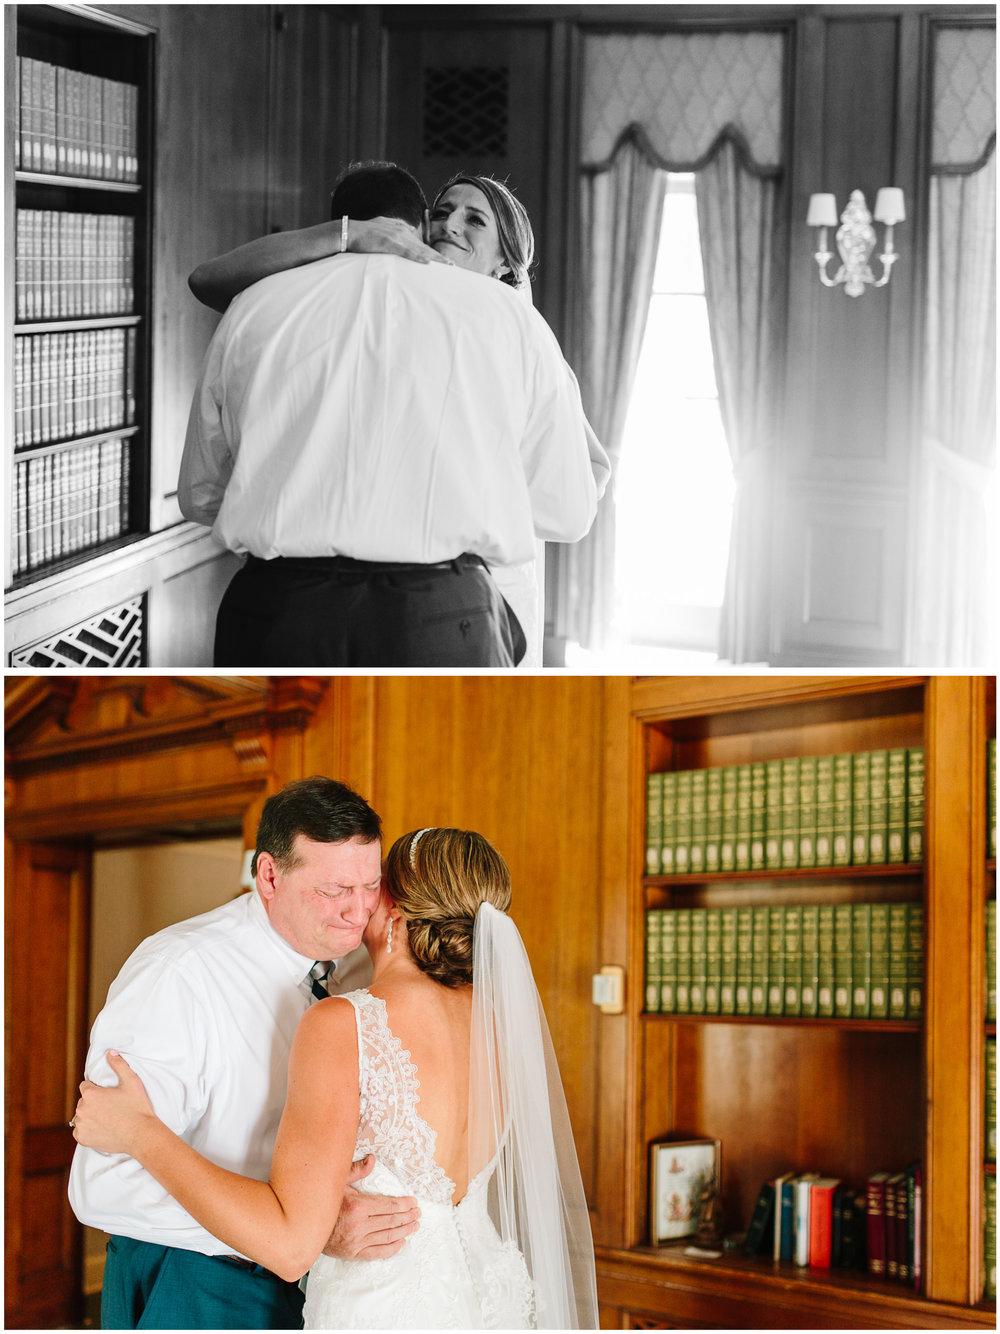 ann_arbor_michigan_wedding_20.jpg